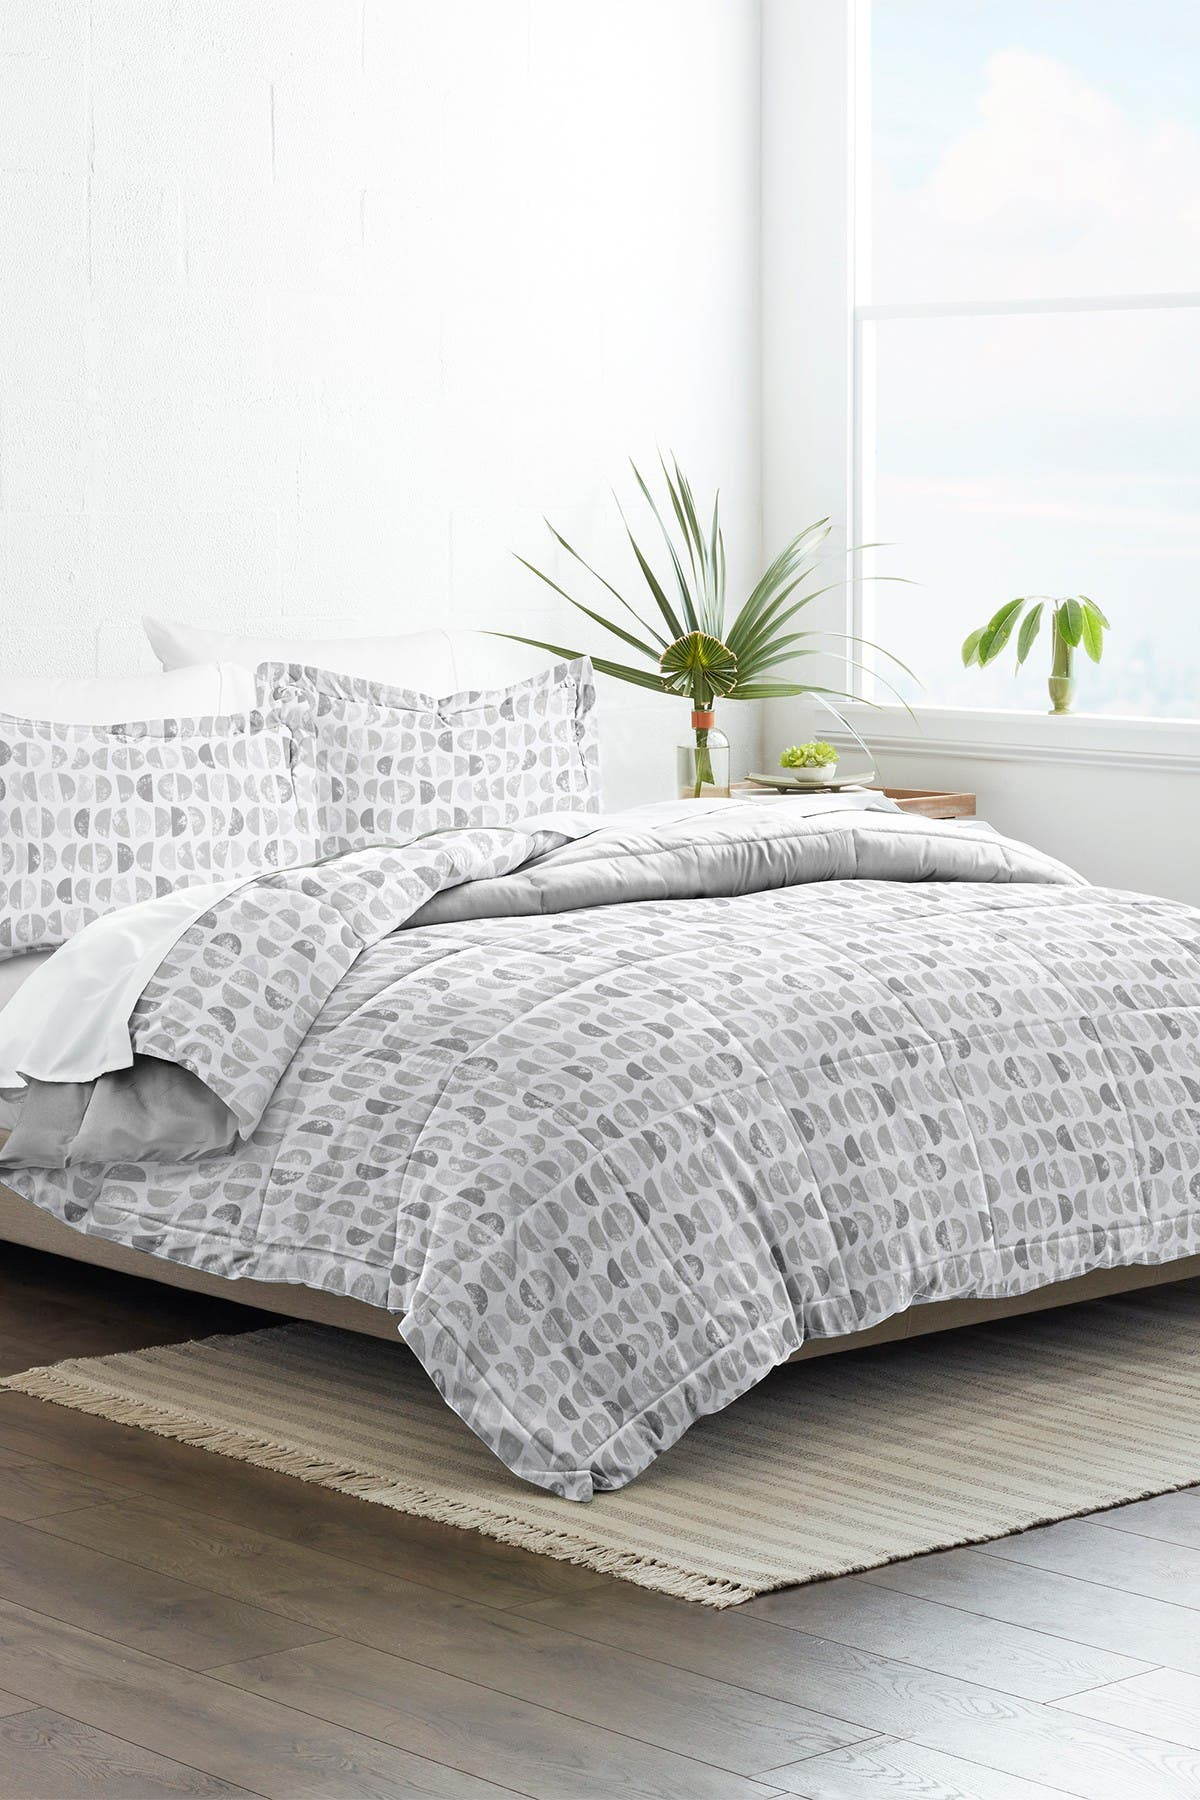 Image of IENJOY HOME Home Collection Premium Down Alternative Moonlight Stars Reversible King/Calfironia King Comforter 3-Piece Set - Light Gray